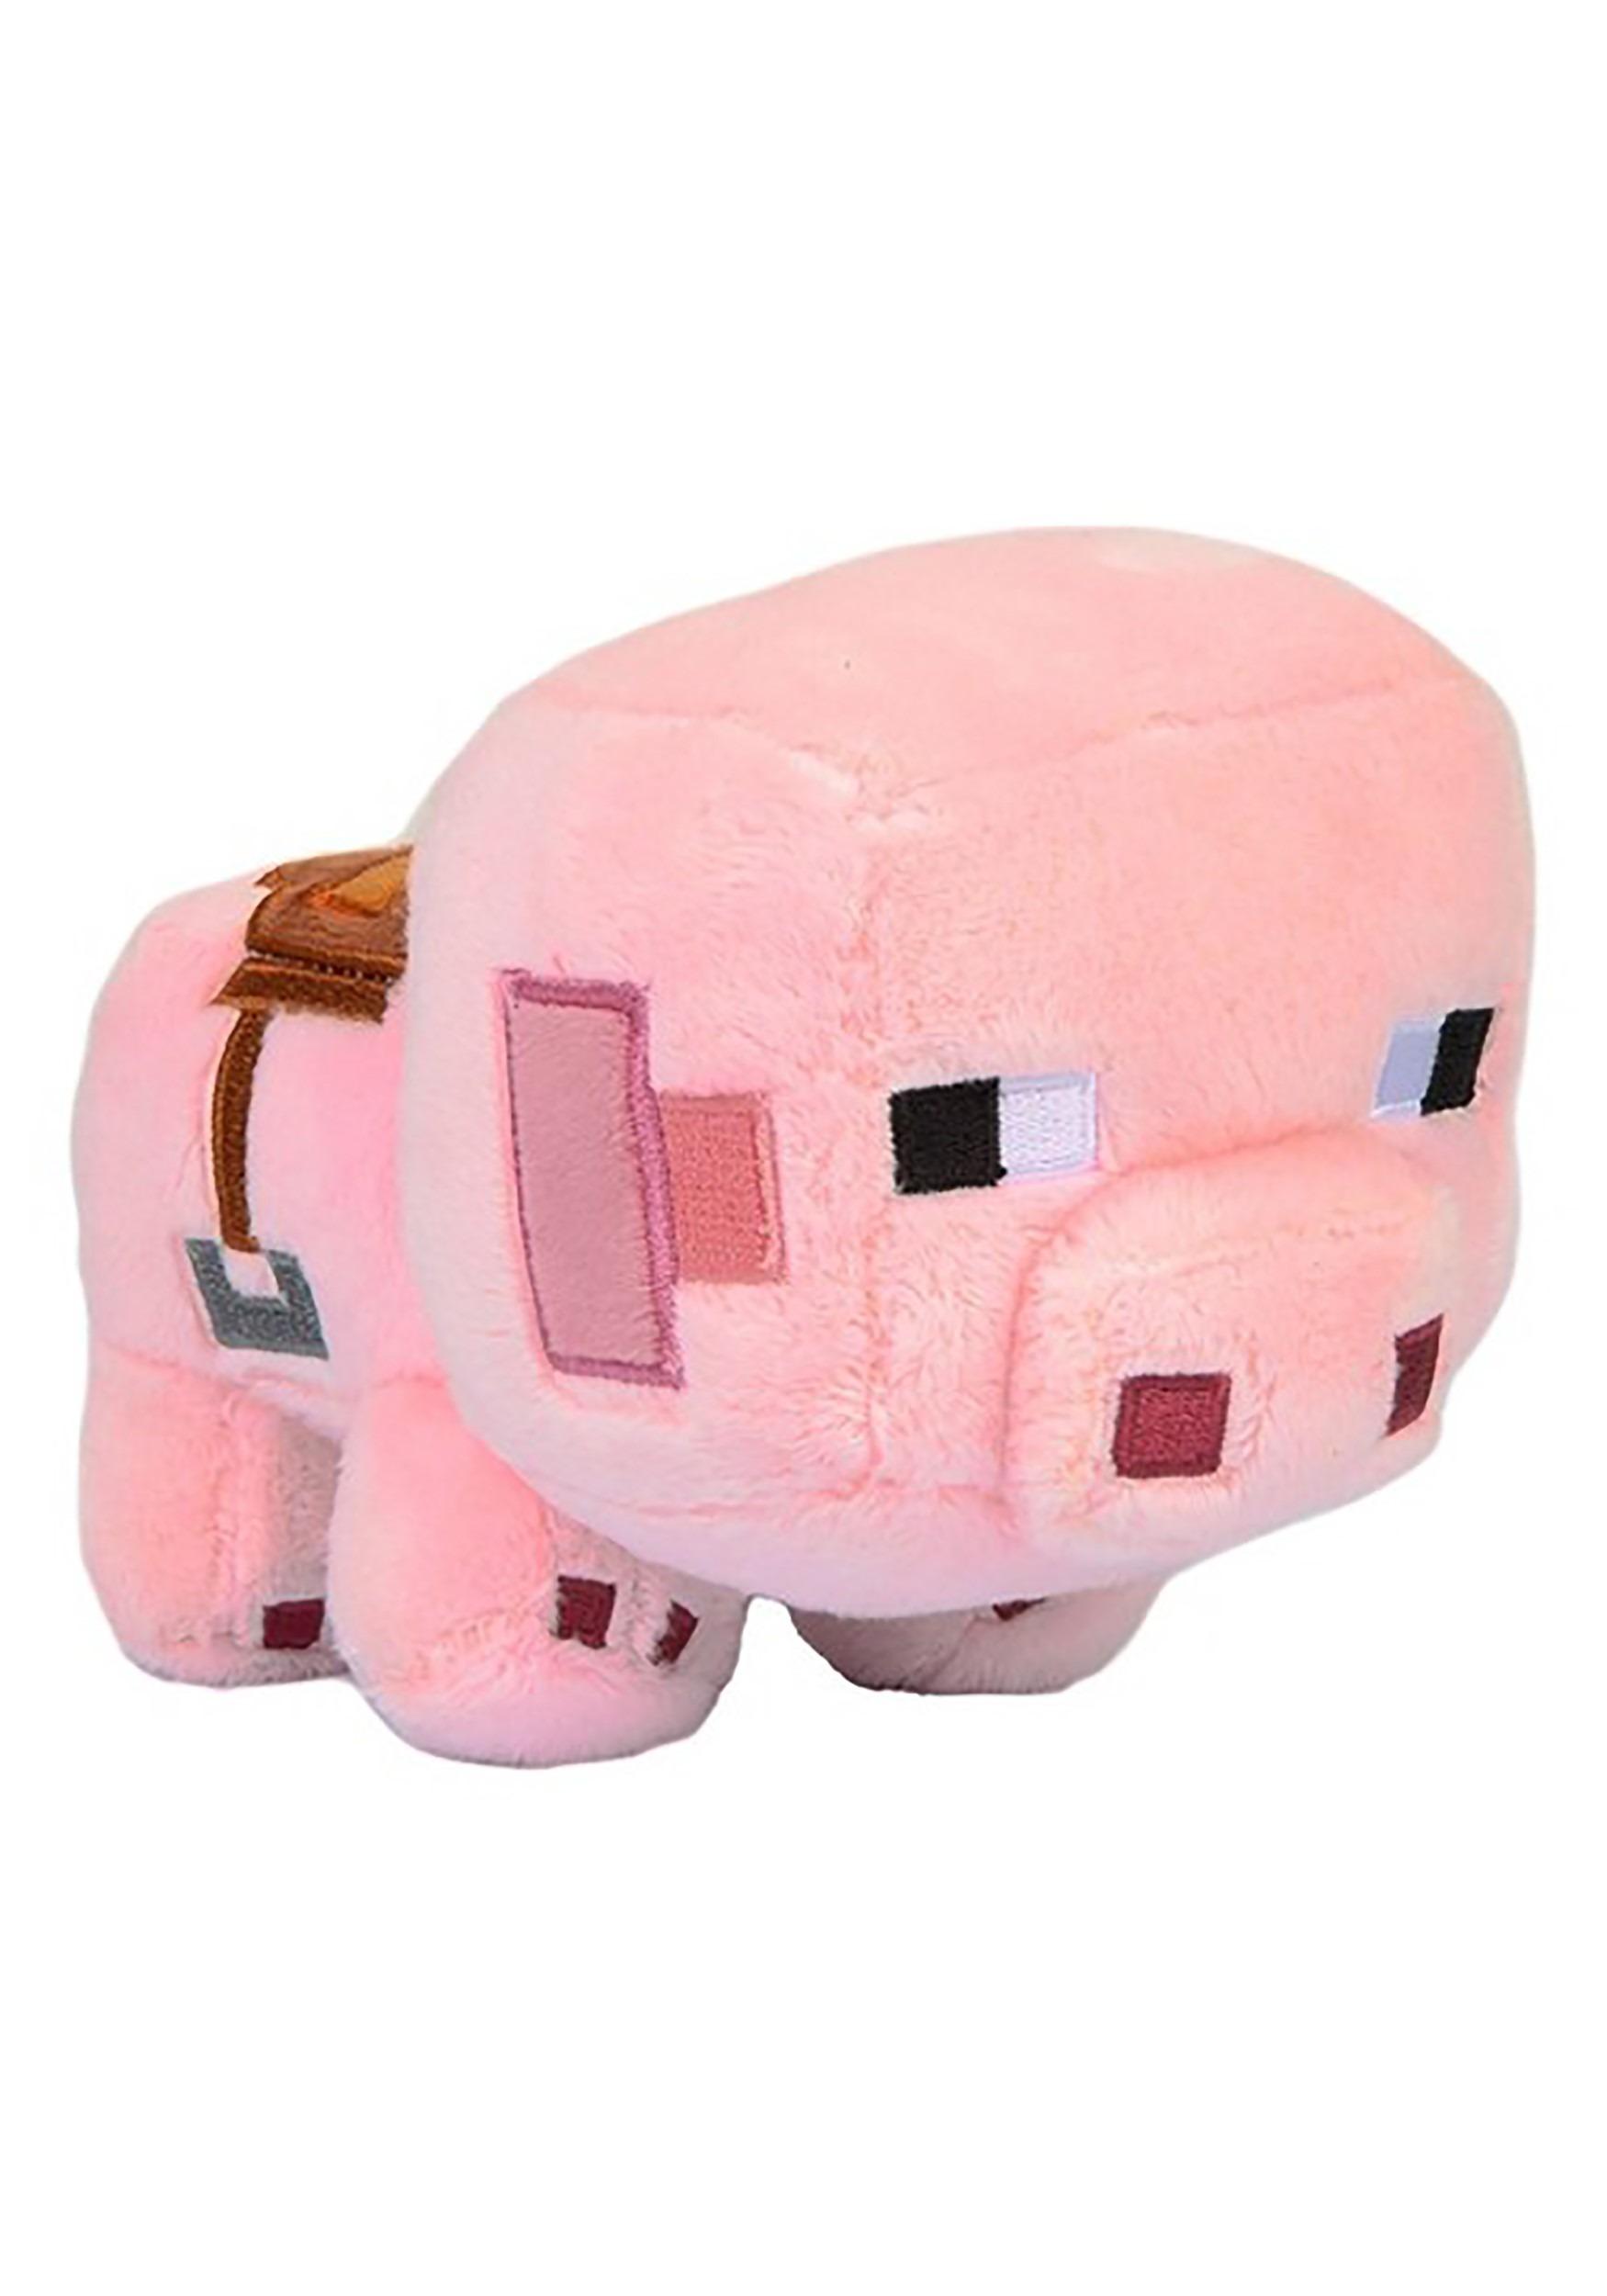 Minecraft Saddled Pig Stuffed Animal